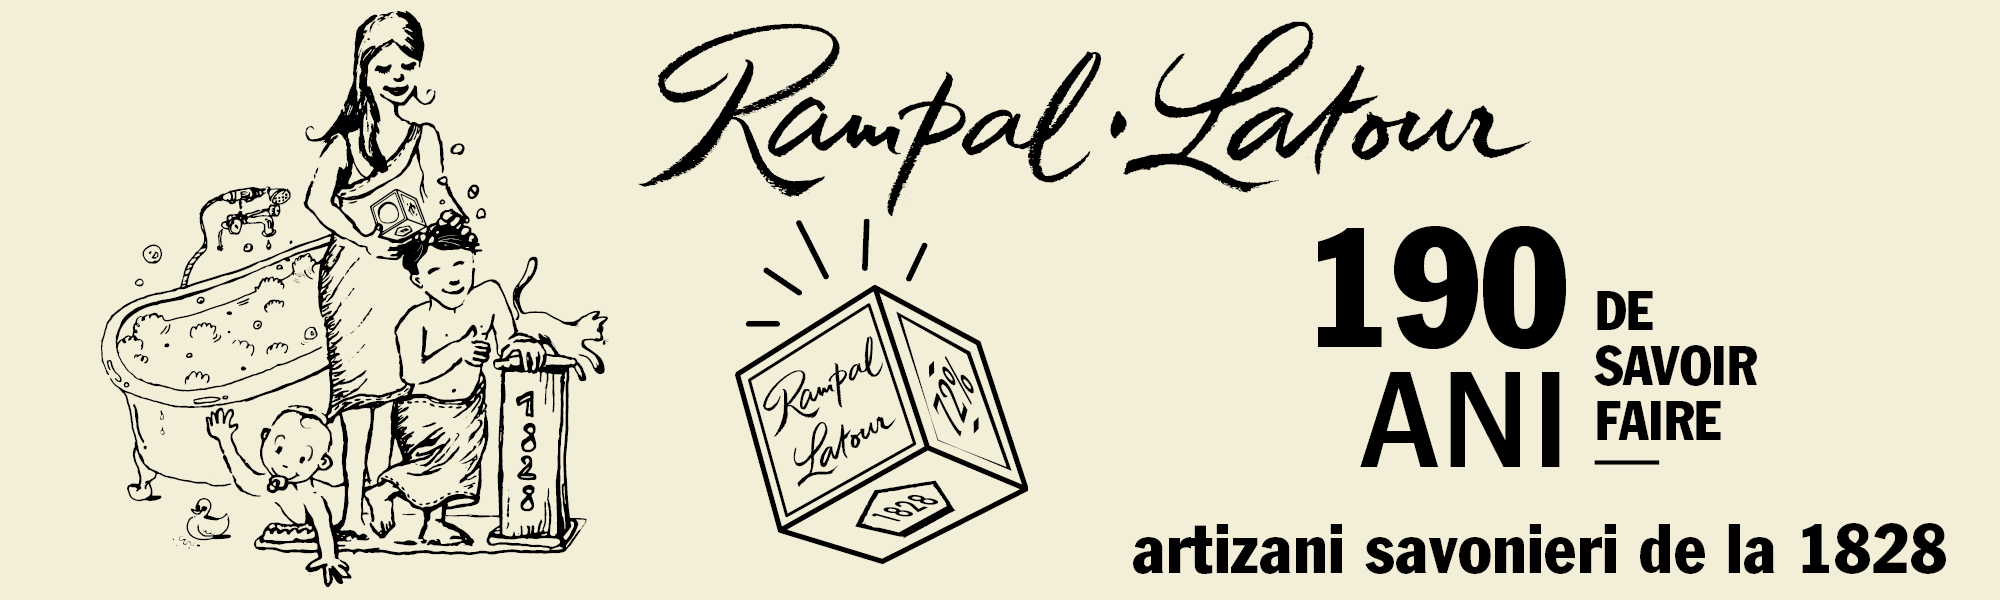 Rampal Latour 190 ani